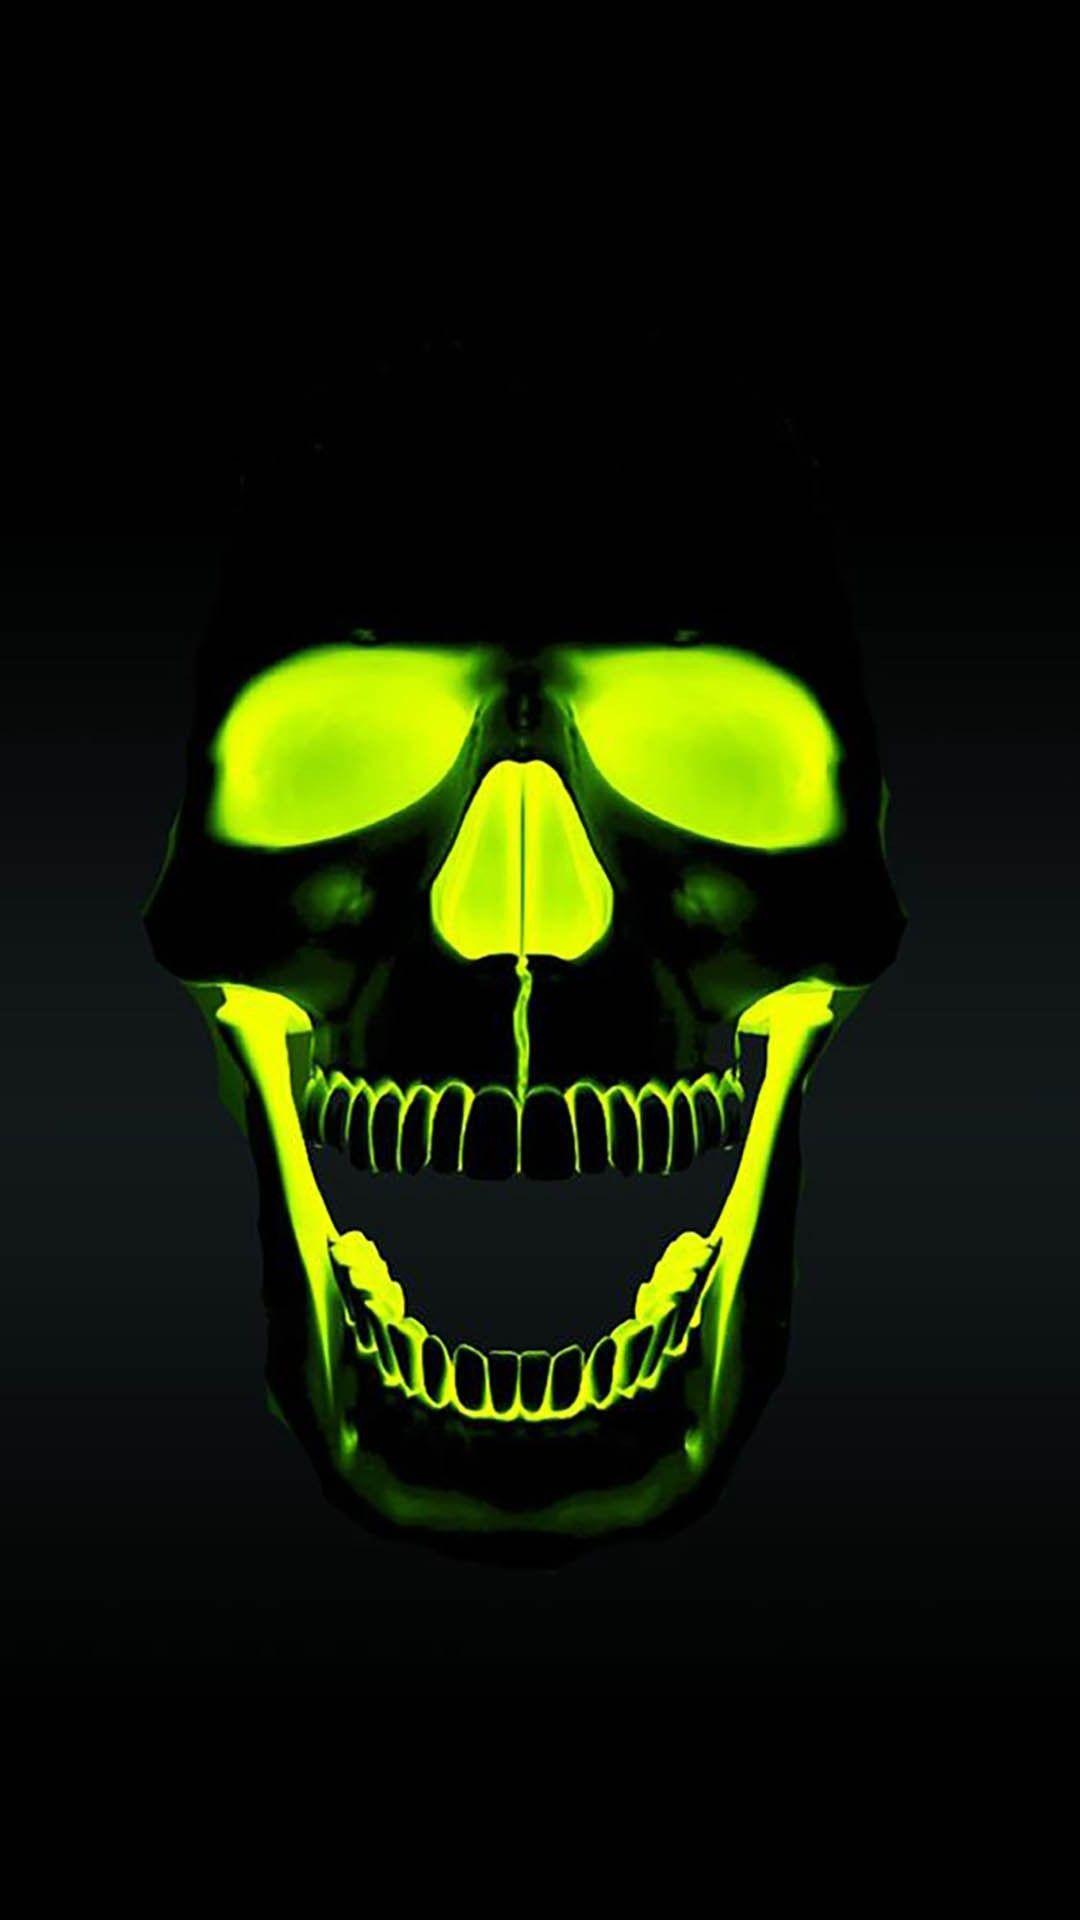 Lyubov 2018 Pinterest Tendencies Tshirt Warhol Skull Hitam S Wallpaper Cool Mobile Pictures And Bones